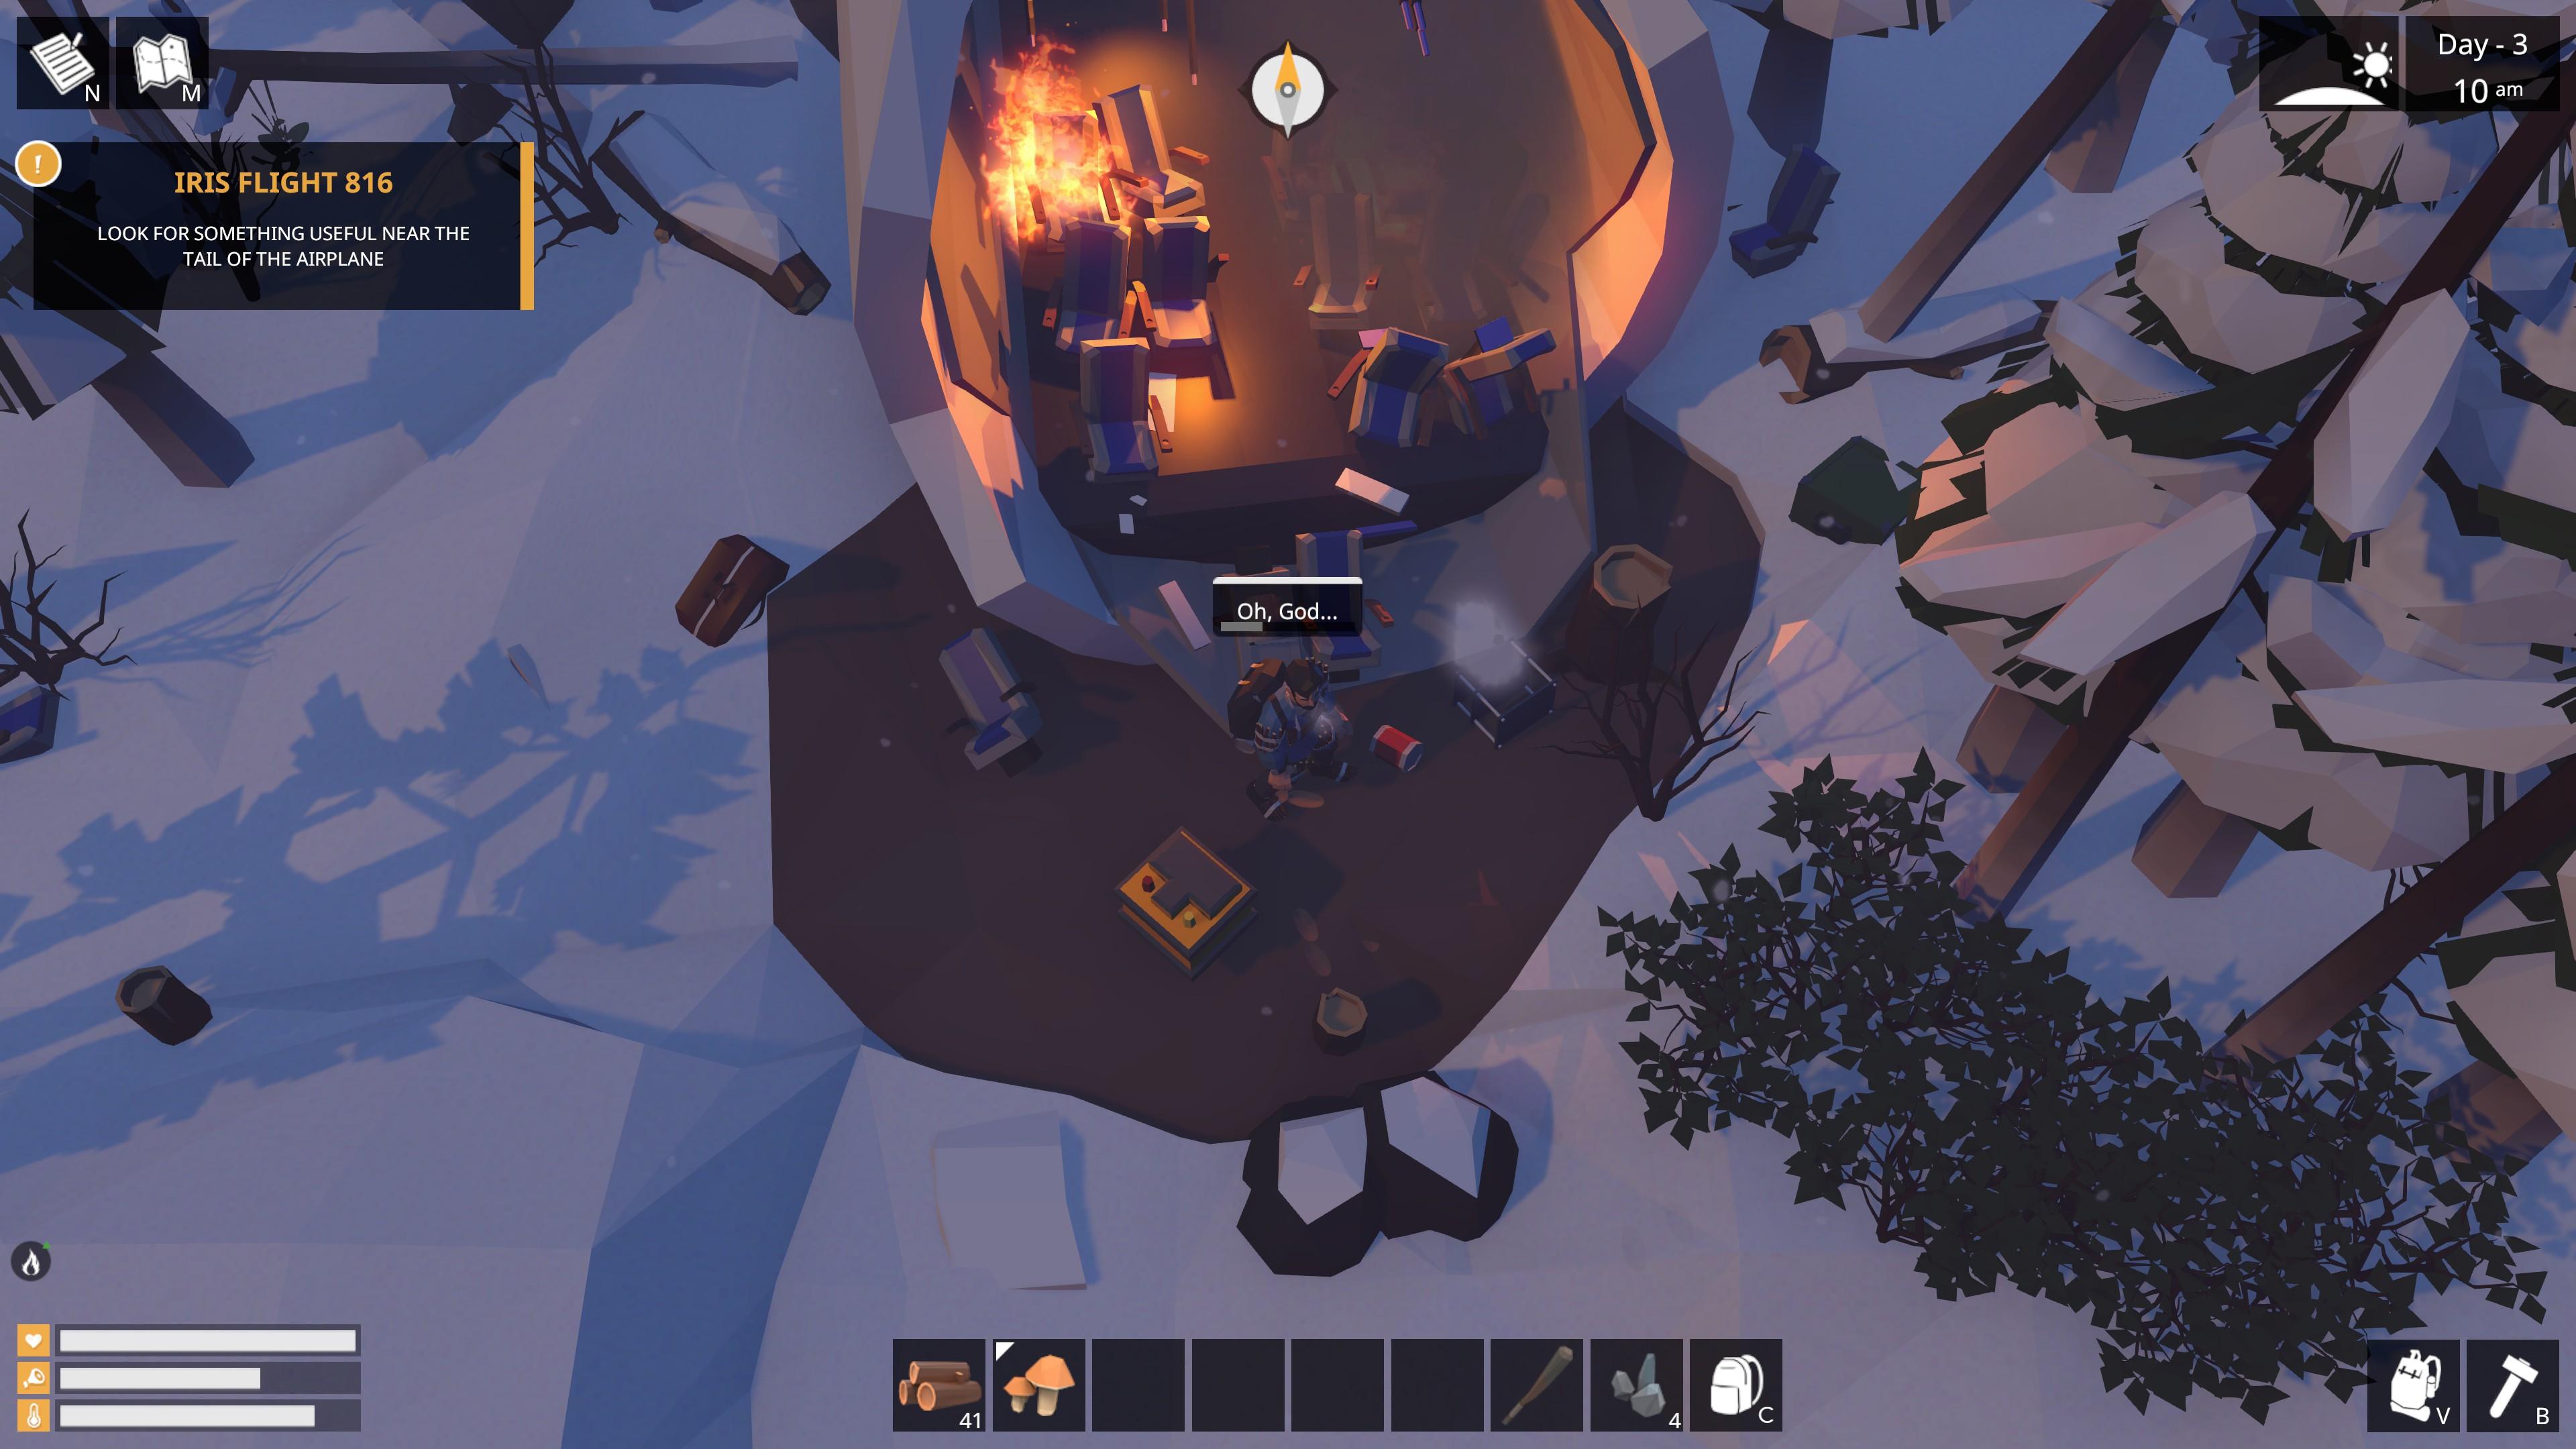 Steam Community :: Guide :: Survival Guide [RETIRED]